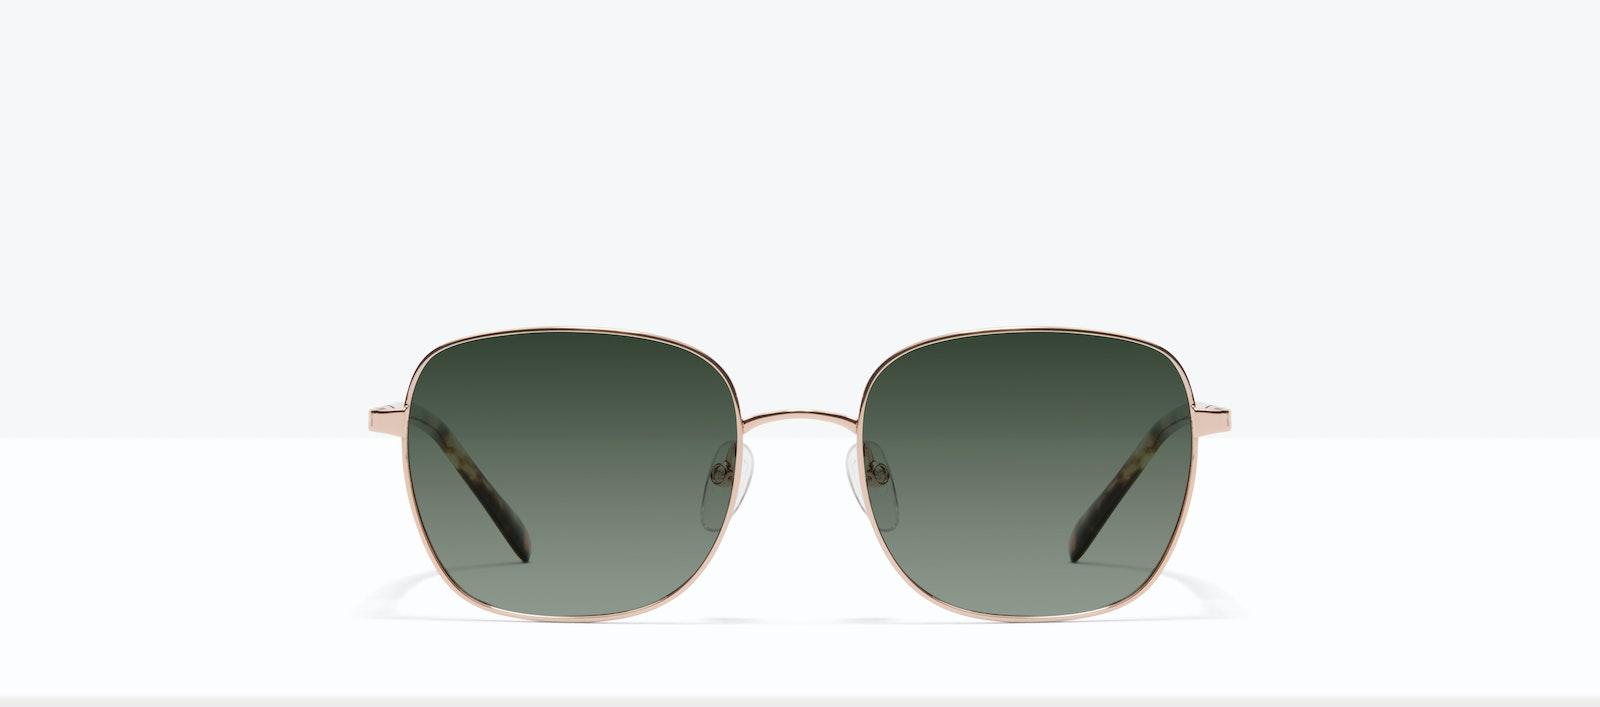 Affordable Fashion Glasses Square Sunglasses Women Henriette M Rose Gold Front